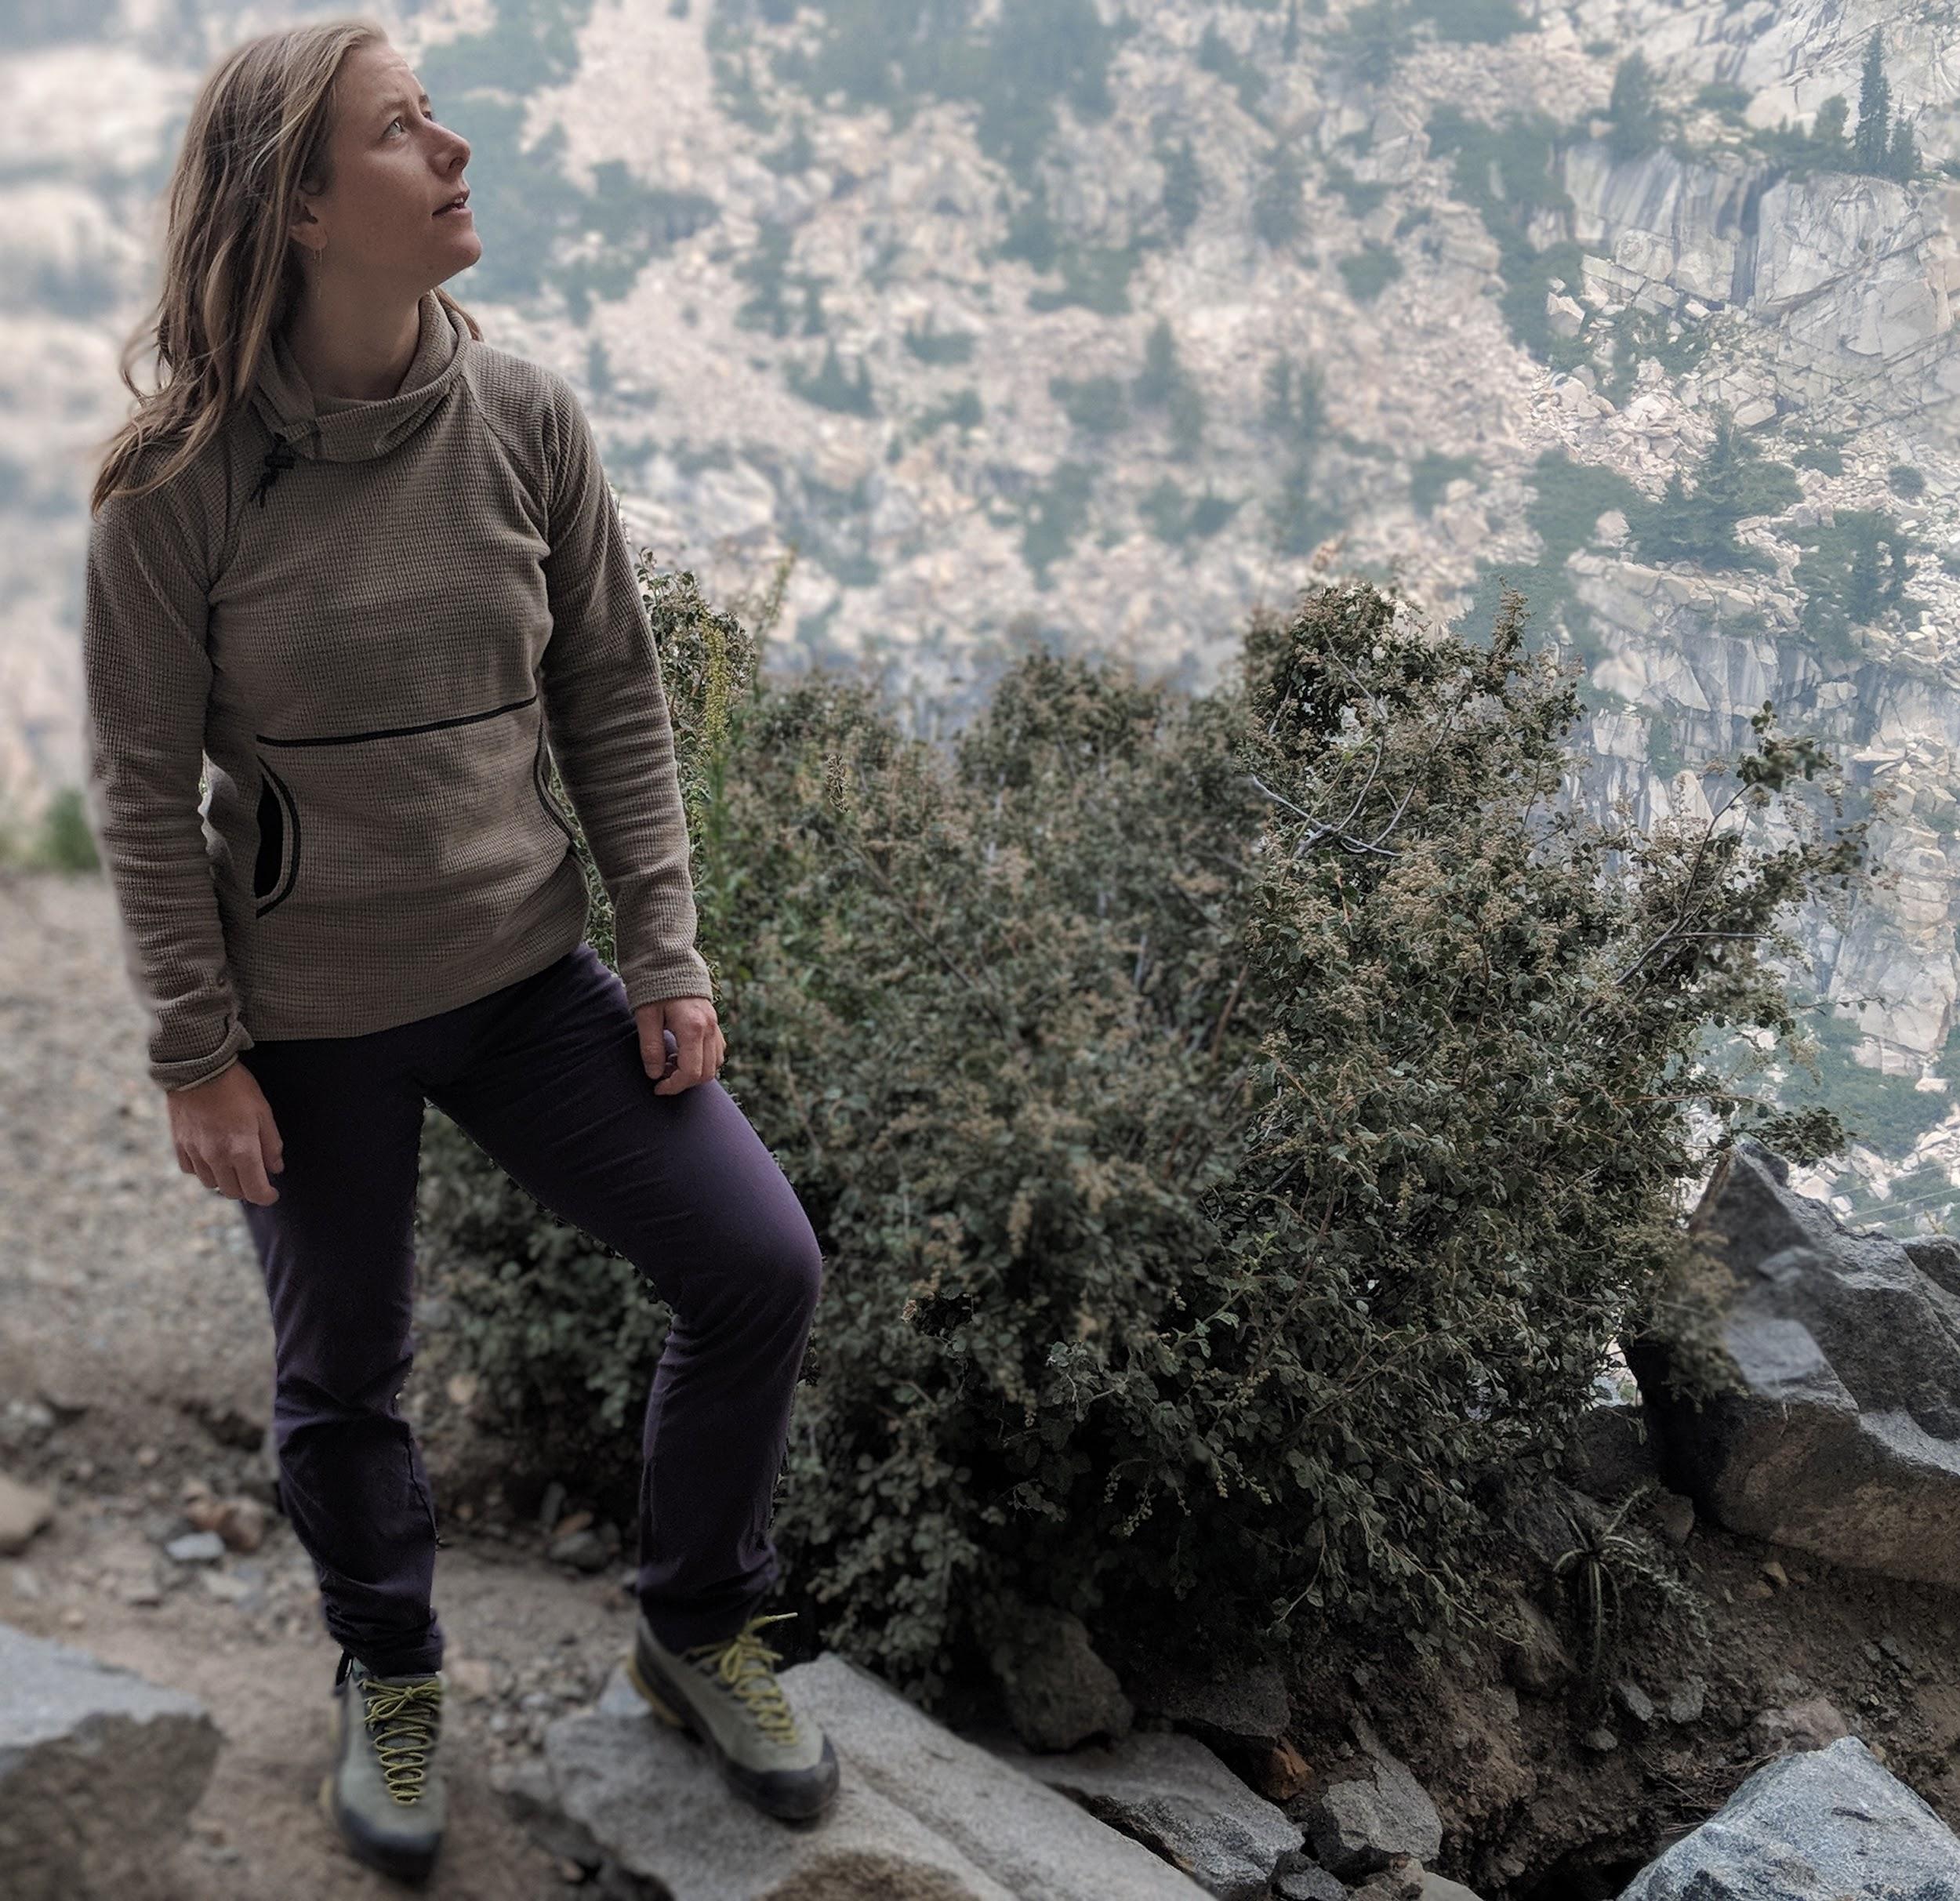 Female Rock Climbing Wearing The Mountain Hardwear Dynama Pants